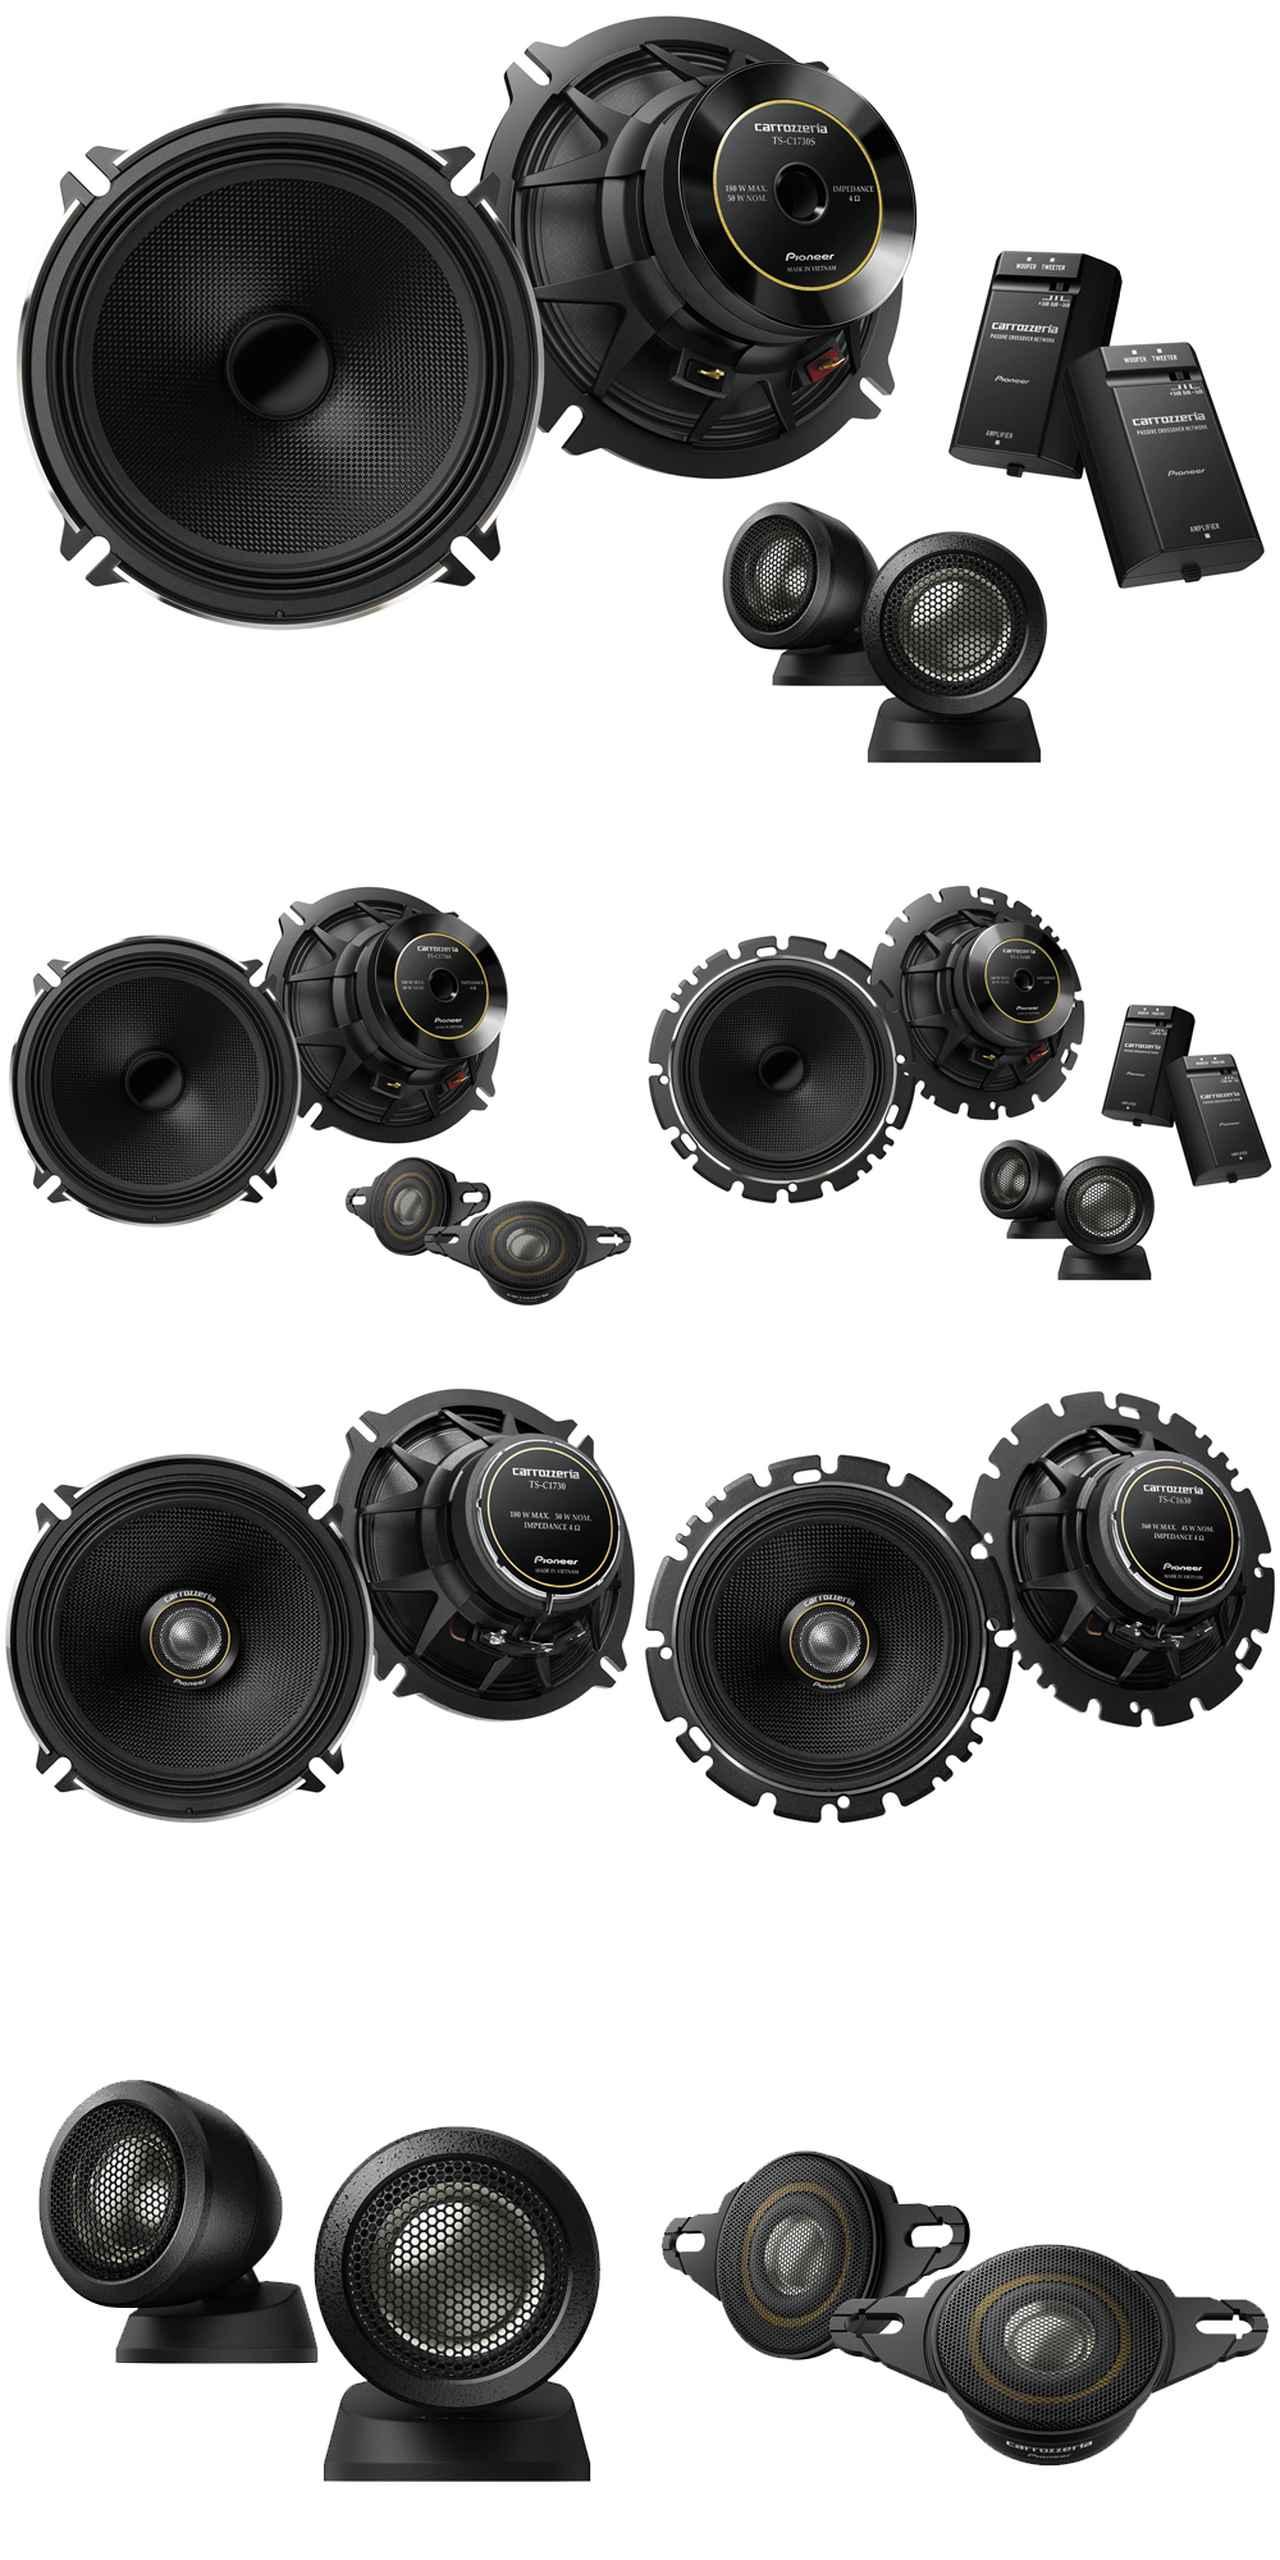 画像: 一番上がTS-C1703S II、2段目左TS-C1736S II、同右TS-C1630S II、3壇目左TS-C1730II、同右TS-C1630II、一番下左ふぁTS-T730II、同右TS-T736II。